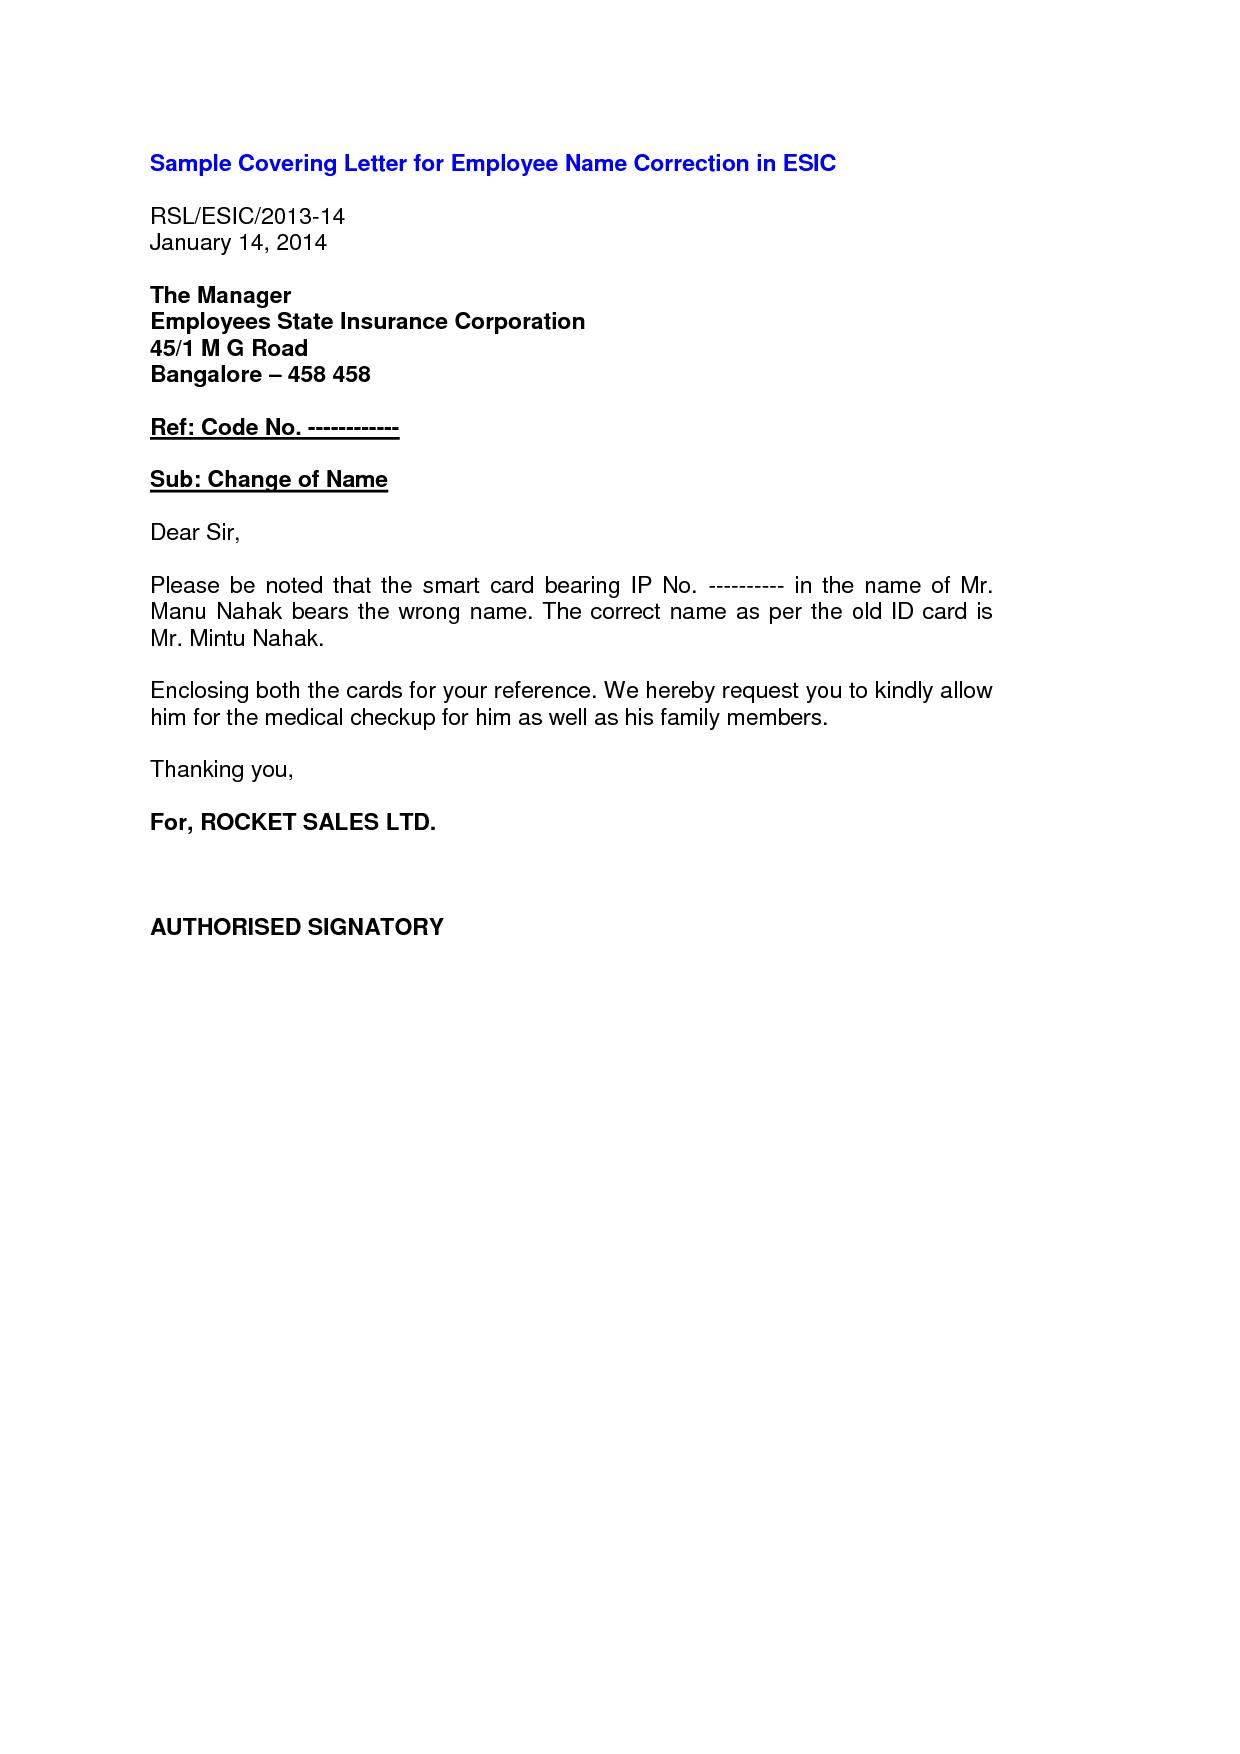 Requesting letter formats madohkotupakka thecheapjerseys Gallery